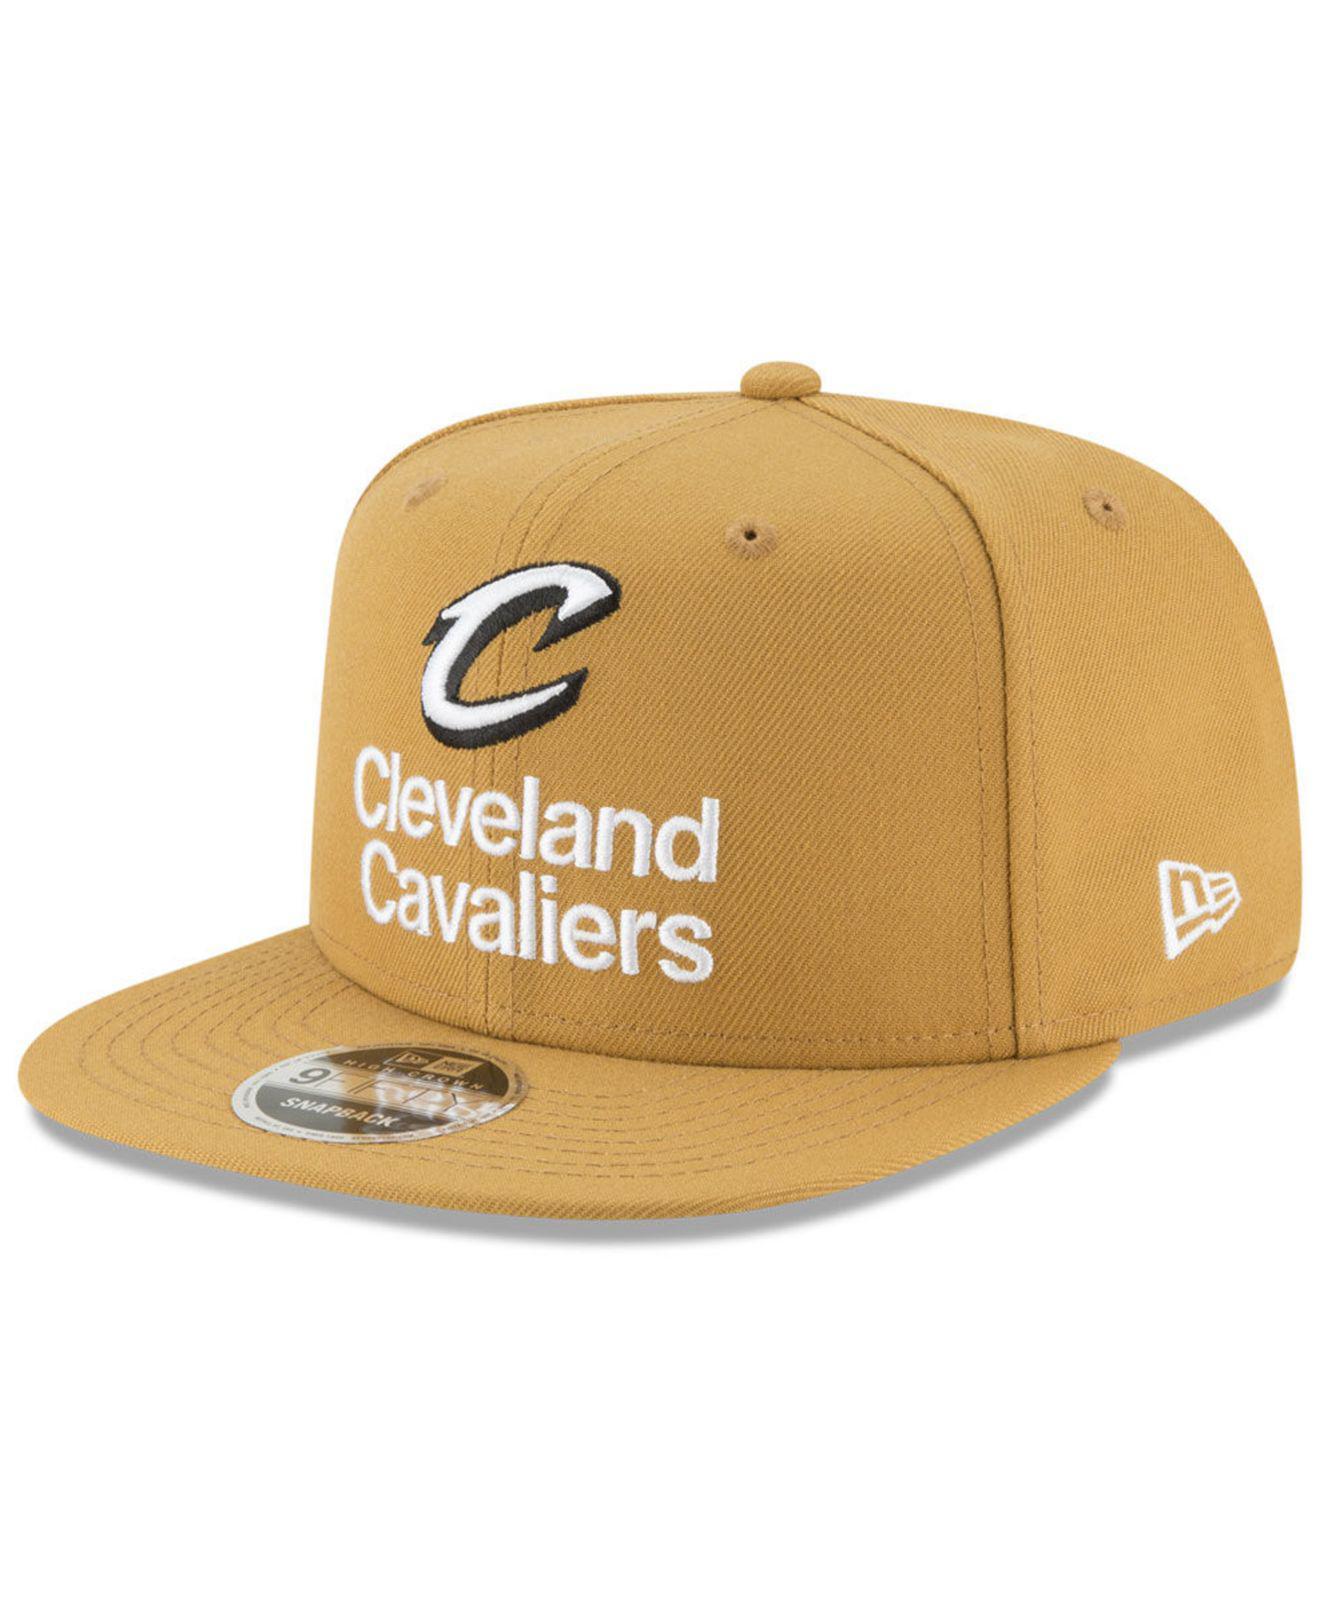 7c80defe9d0 Lyst - Ktz Cleveland Cavaliers Retro Basic 9fifty Snapback Cap for Men